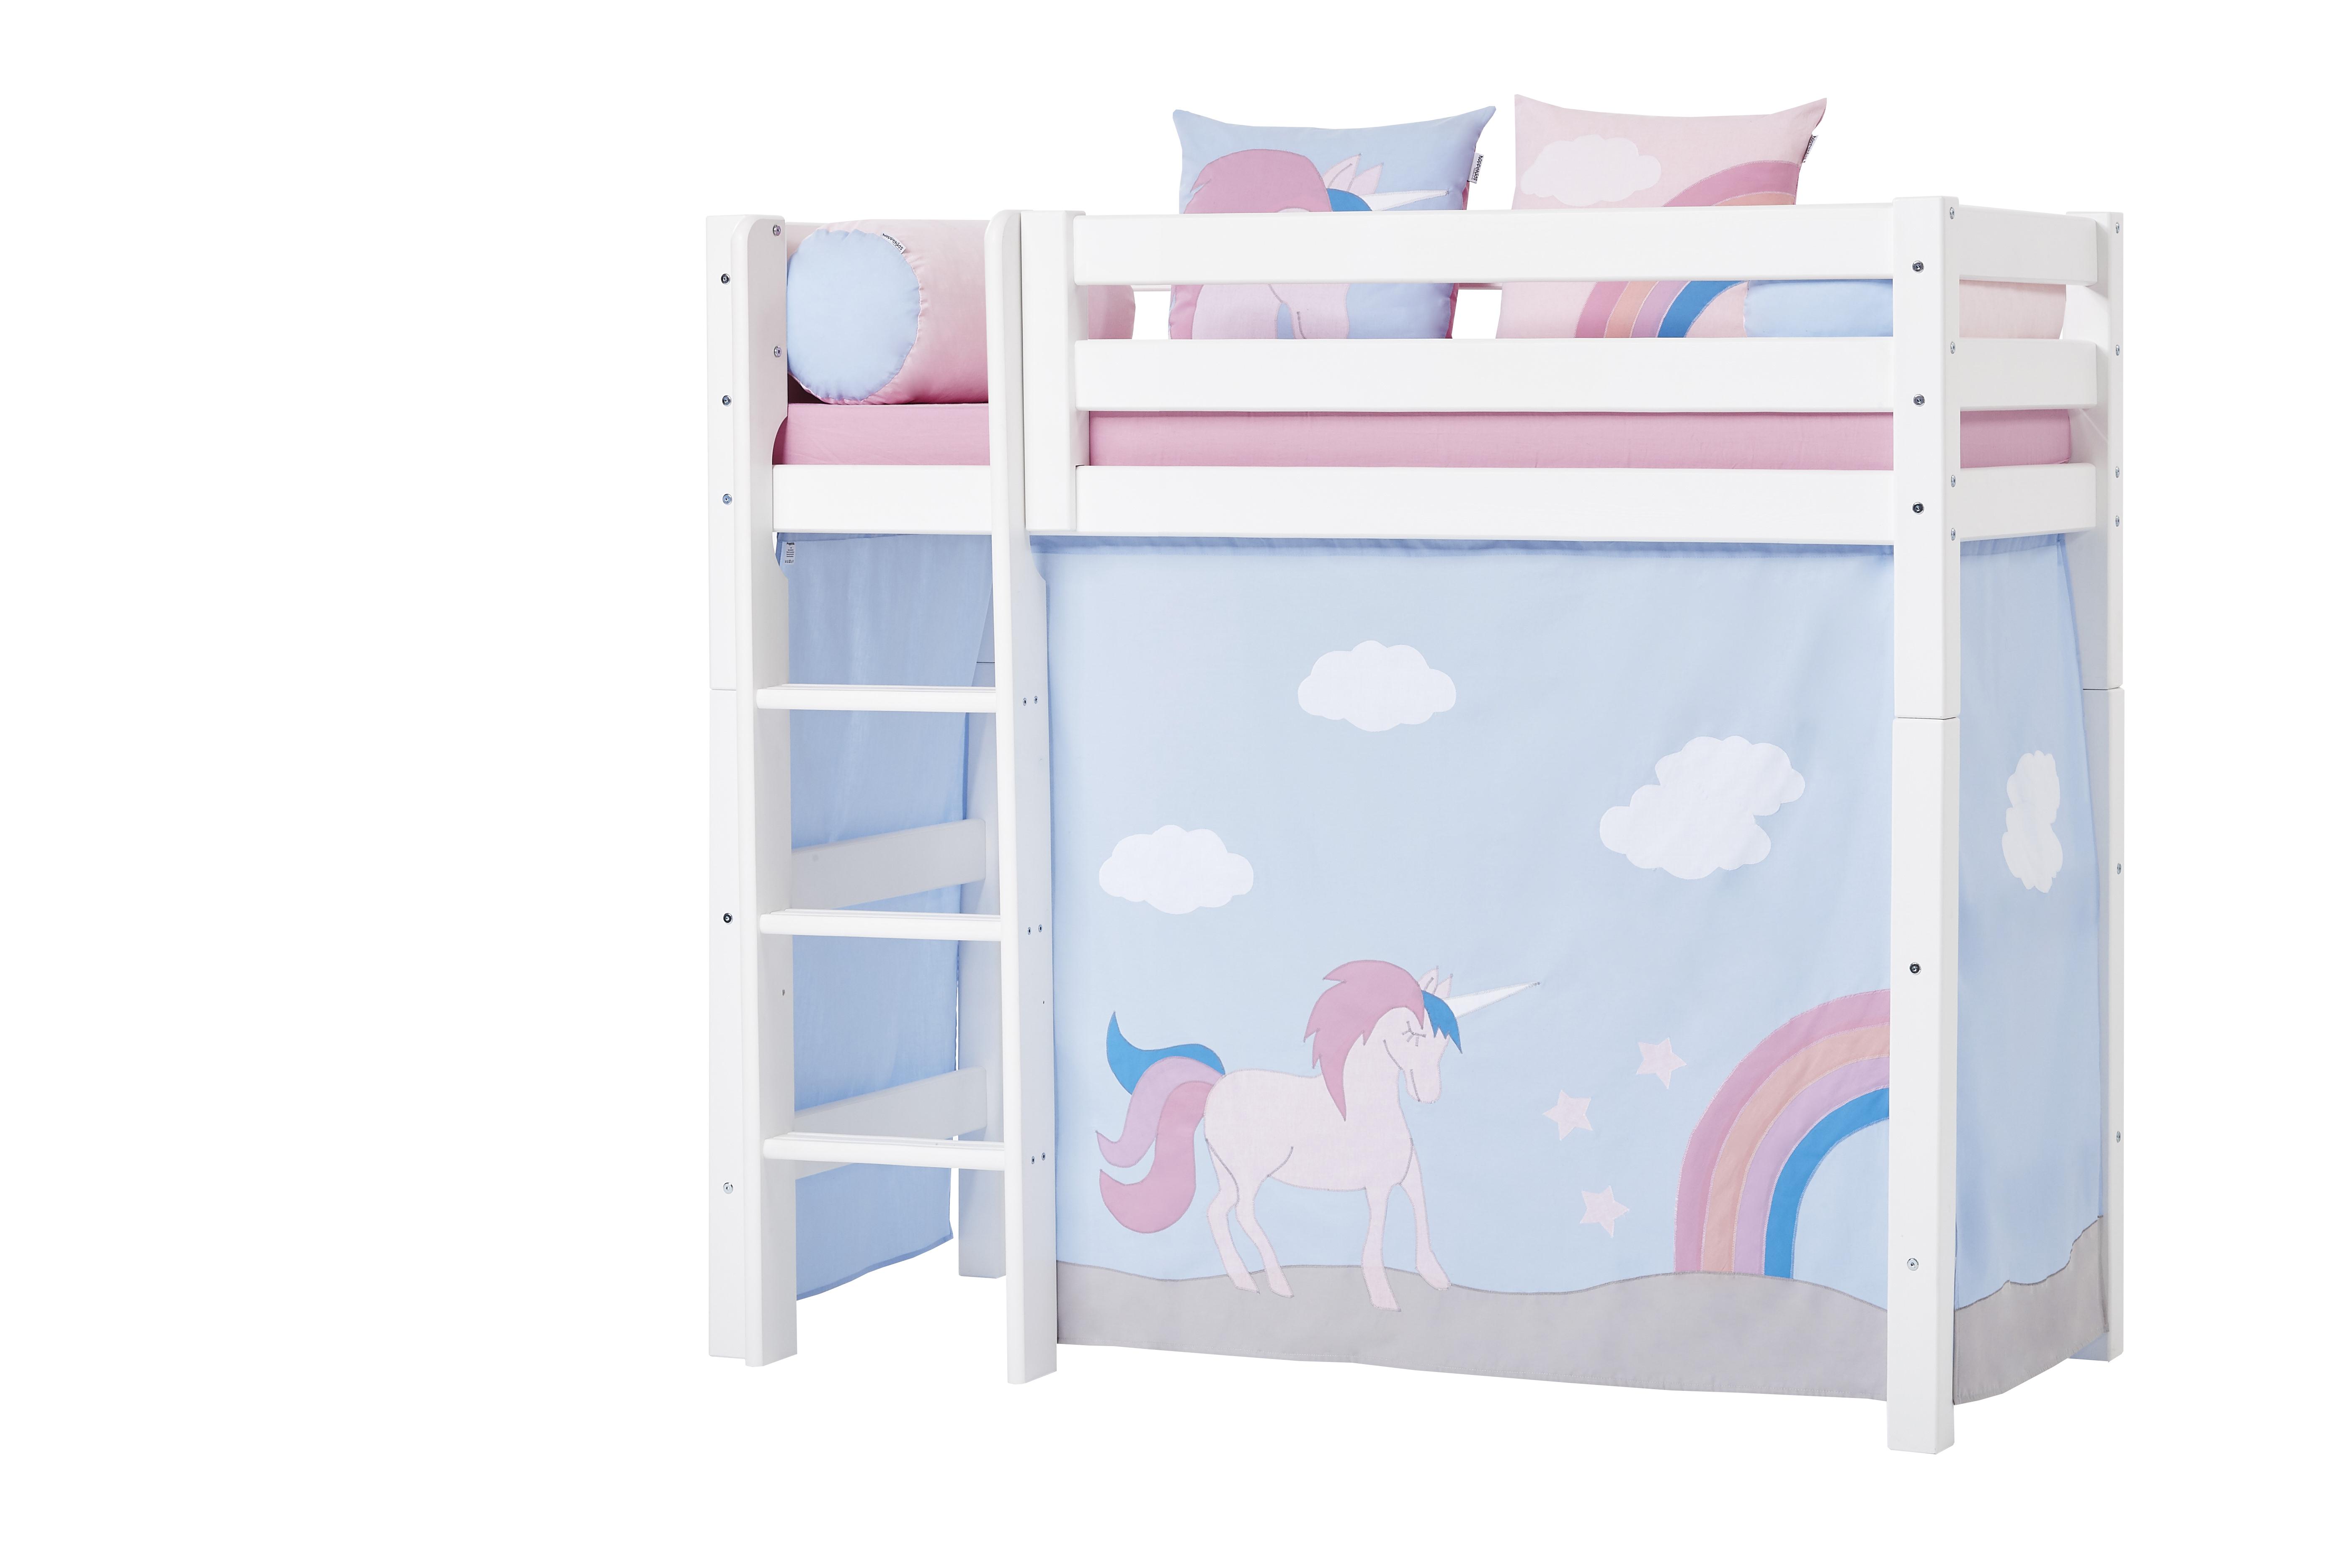 Hoppekids - Play Curtain Mid-High Bed 70x160 cm - Unicorn